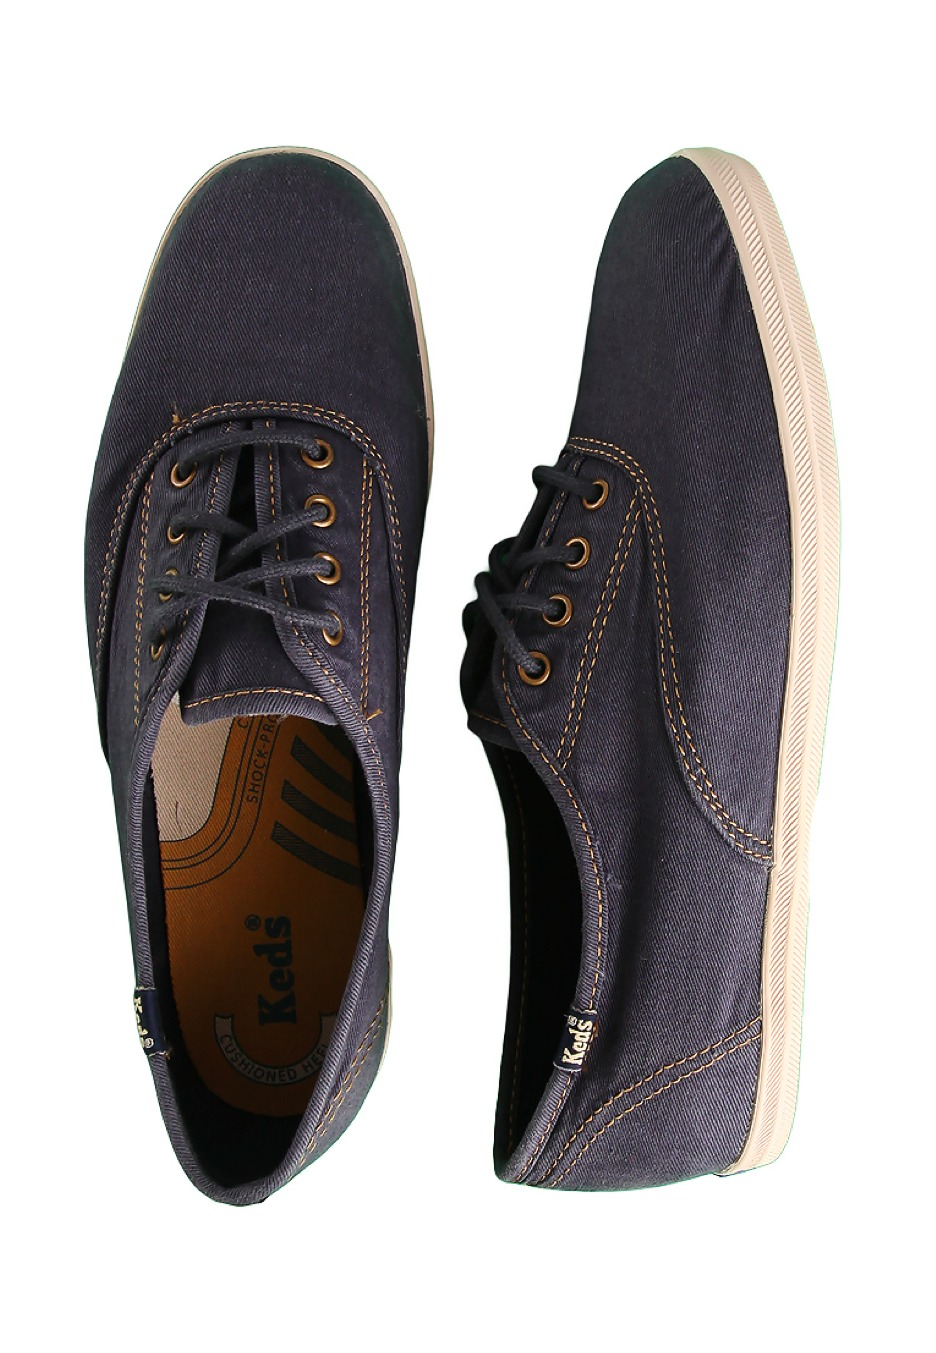 Keds shoes outlet Shoes for men online